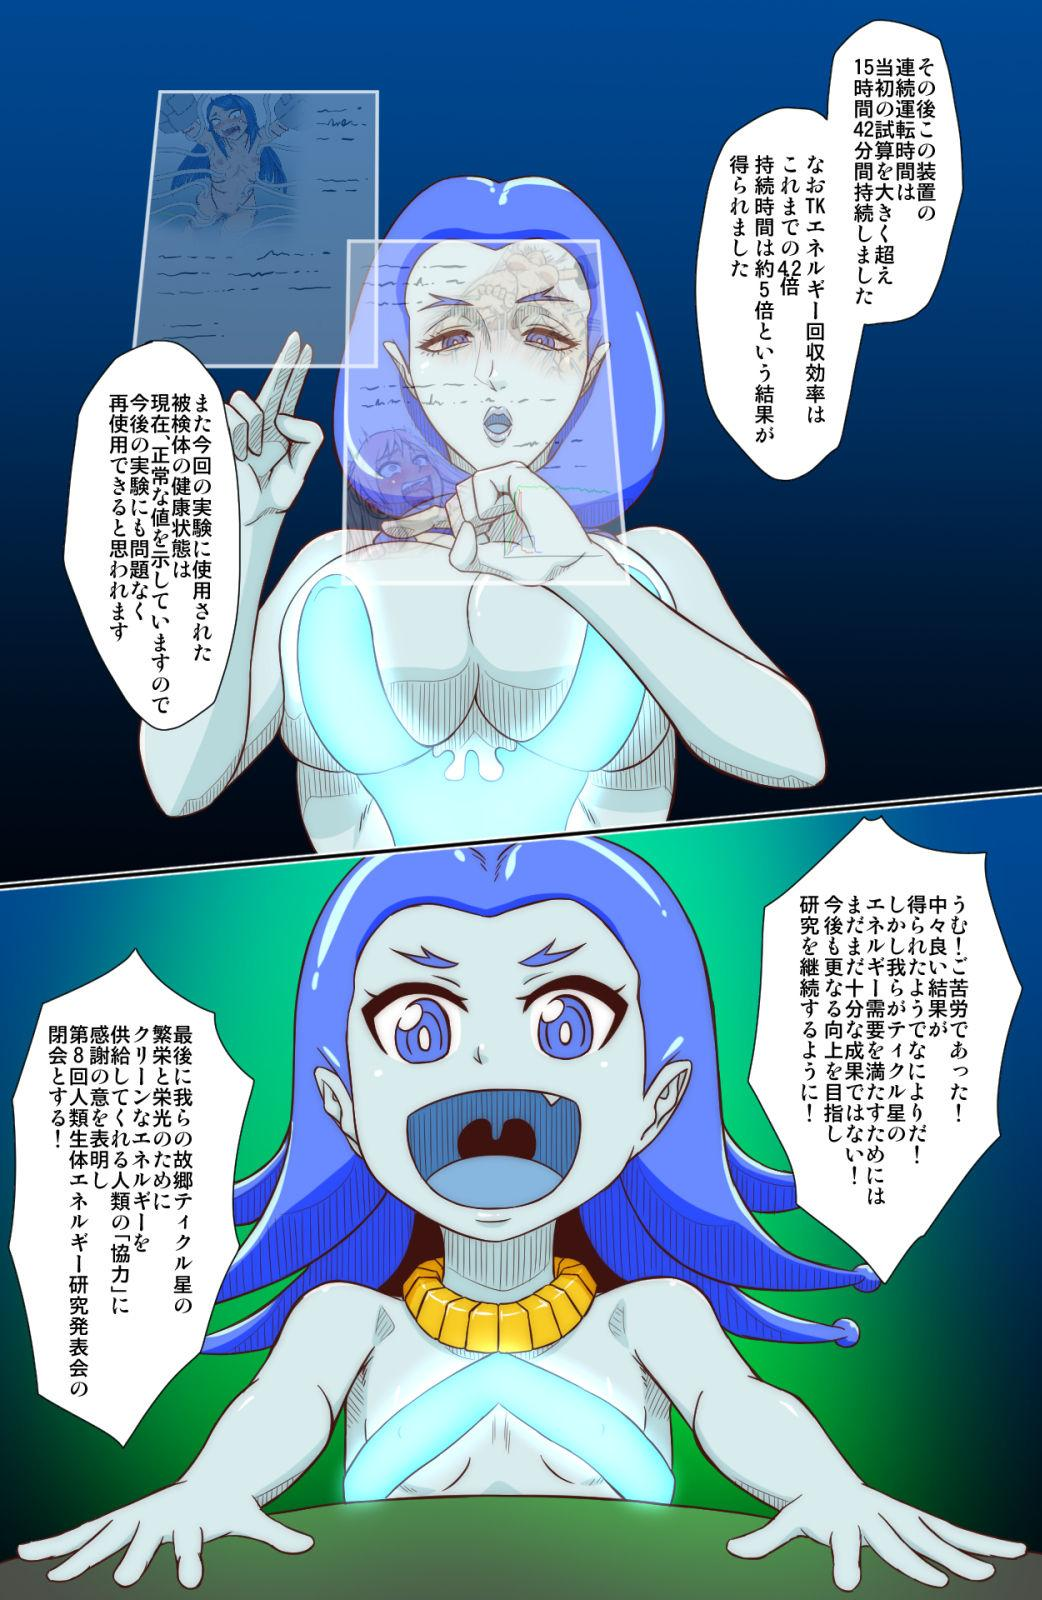 Tickle Seijin ni Yoru Kusuguri Energy Kenkyuu Report 15